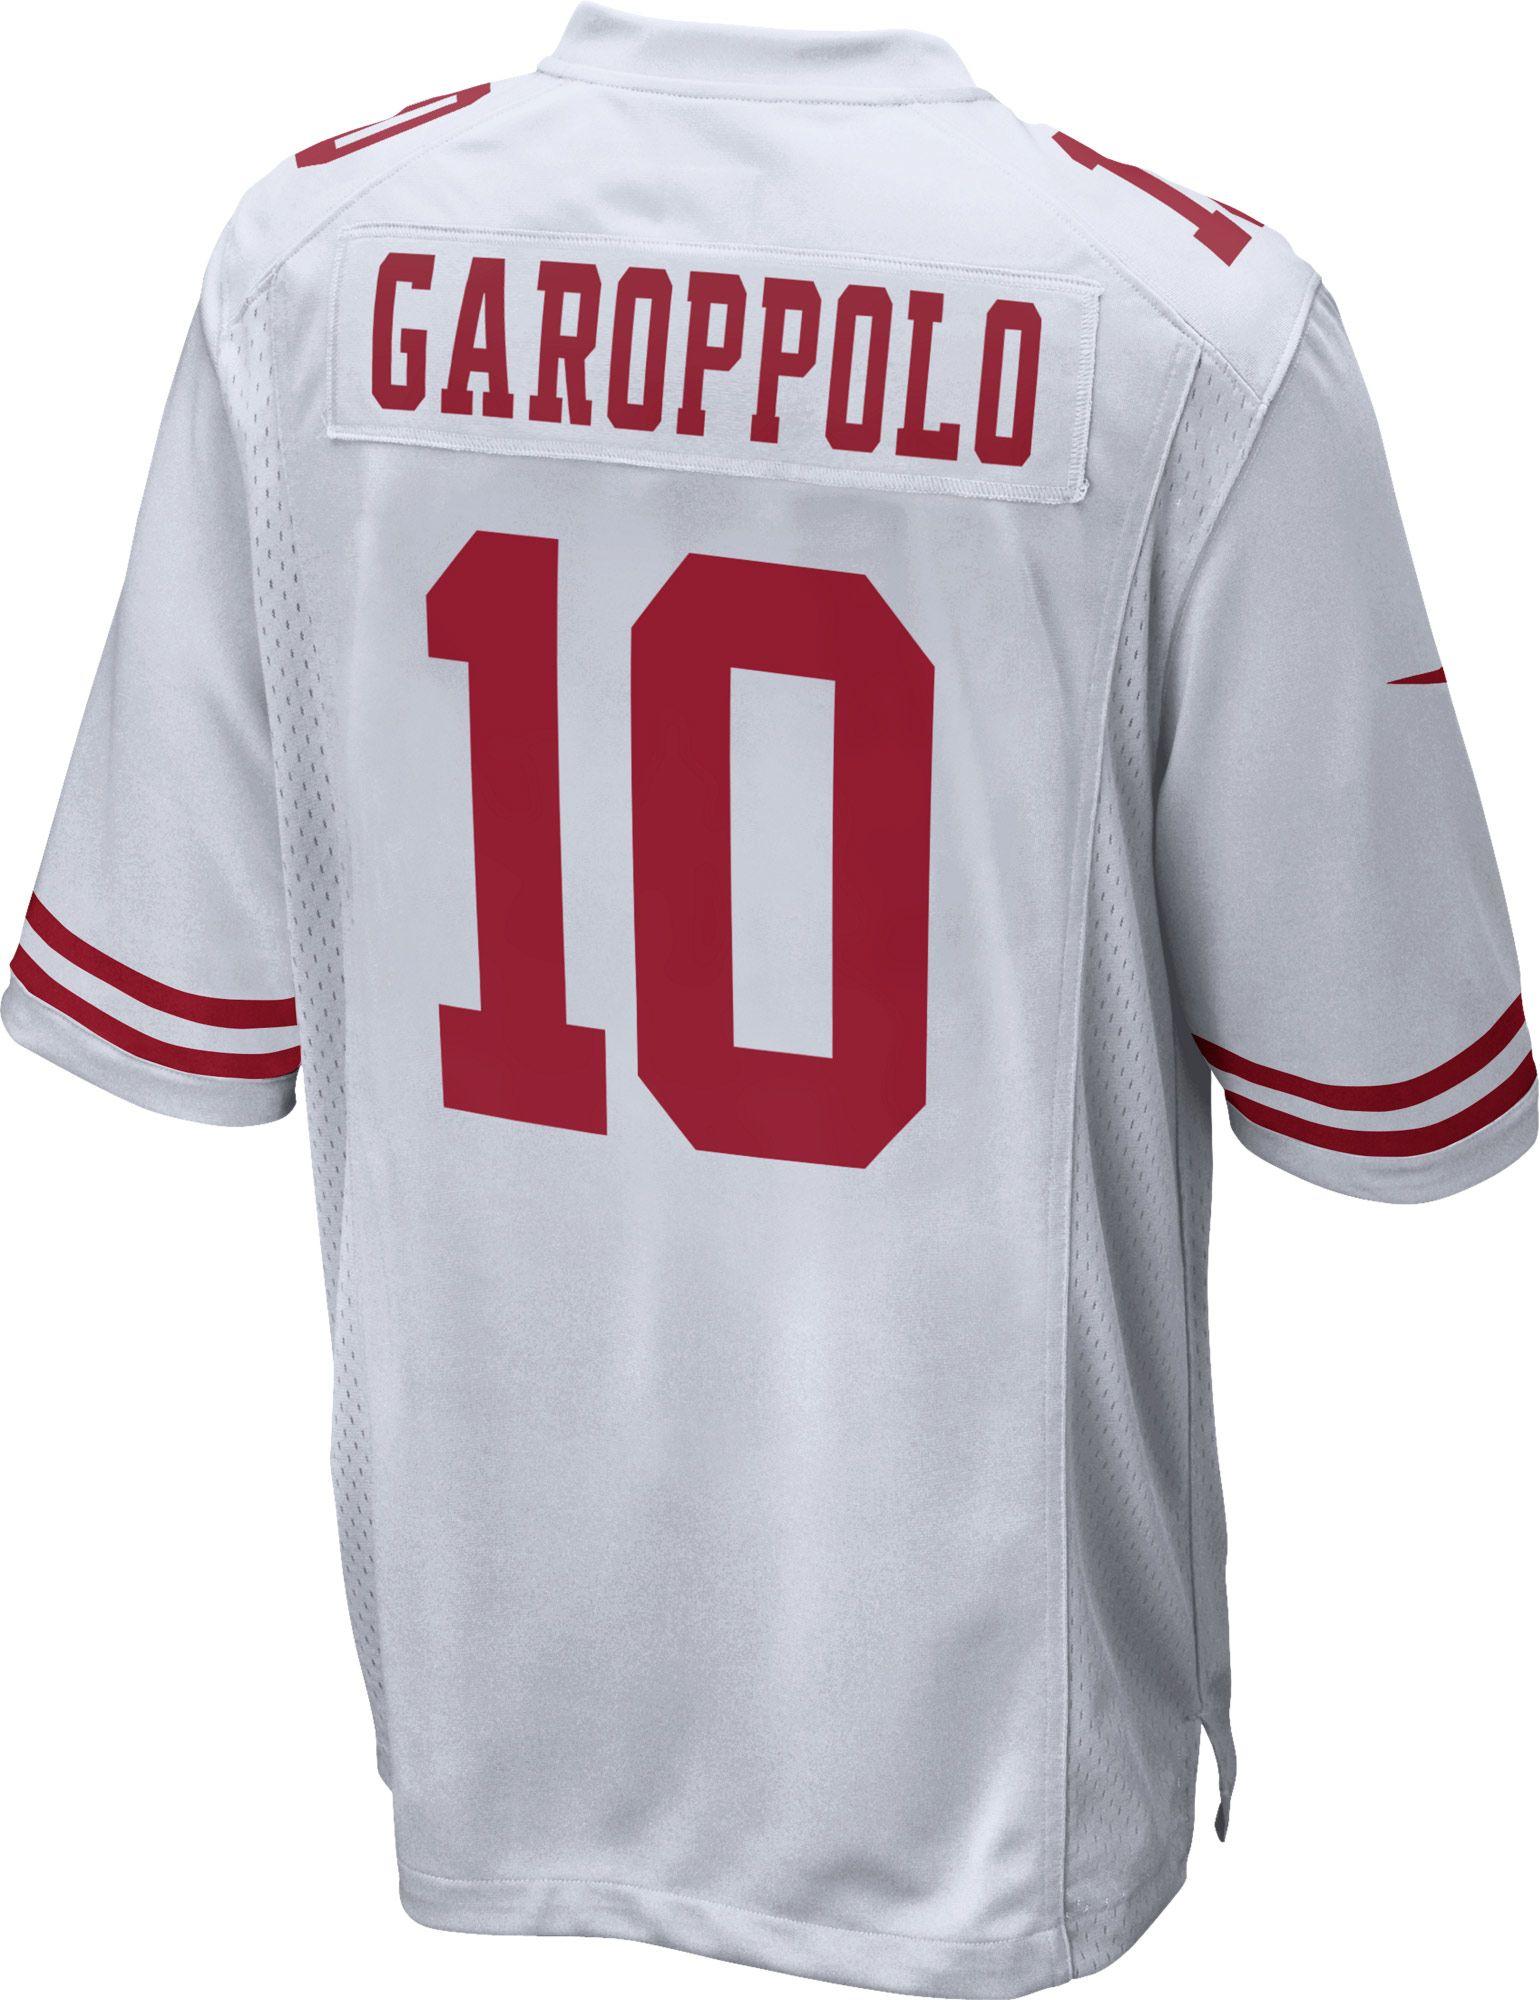 nike men s away game jersey san francisco 49ers jimmy garoppolo 10 rh dickssportinggoods com